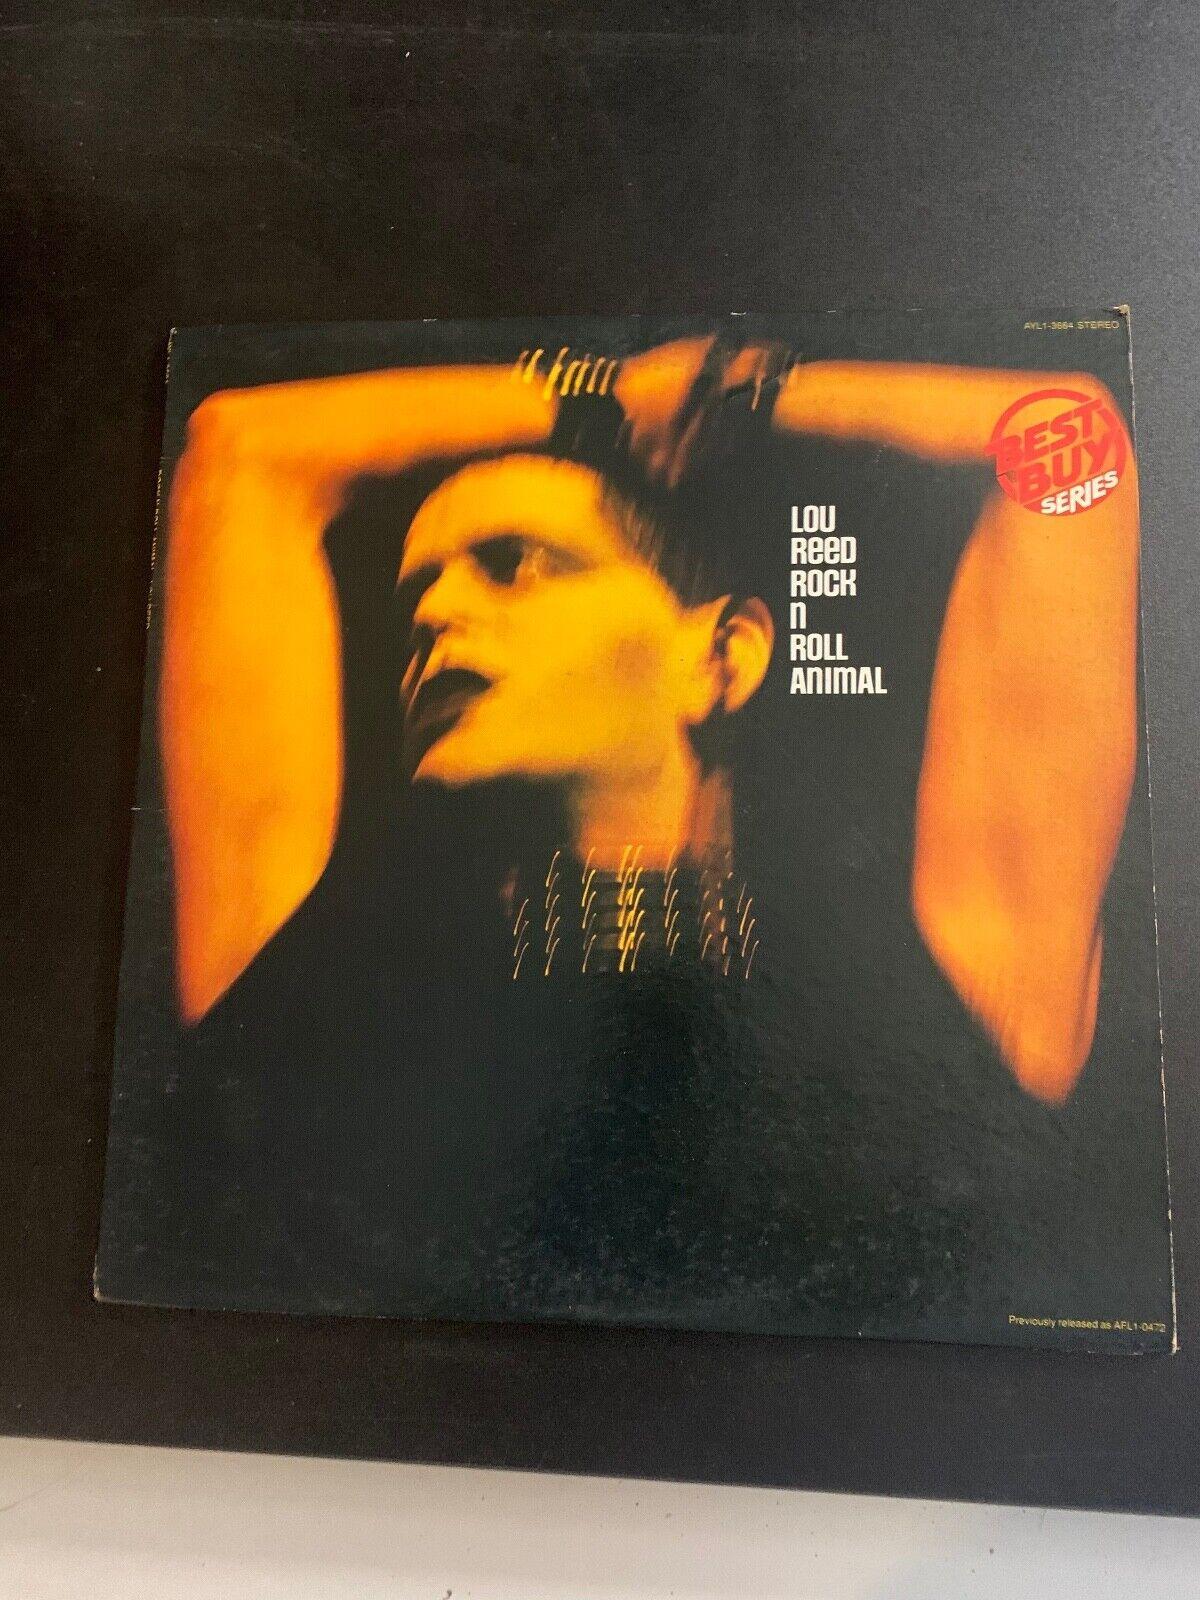 LP RECORD - LOU REED - ROCK N ROLL ANIMAL - ECA RECORDS - $12.99